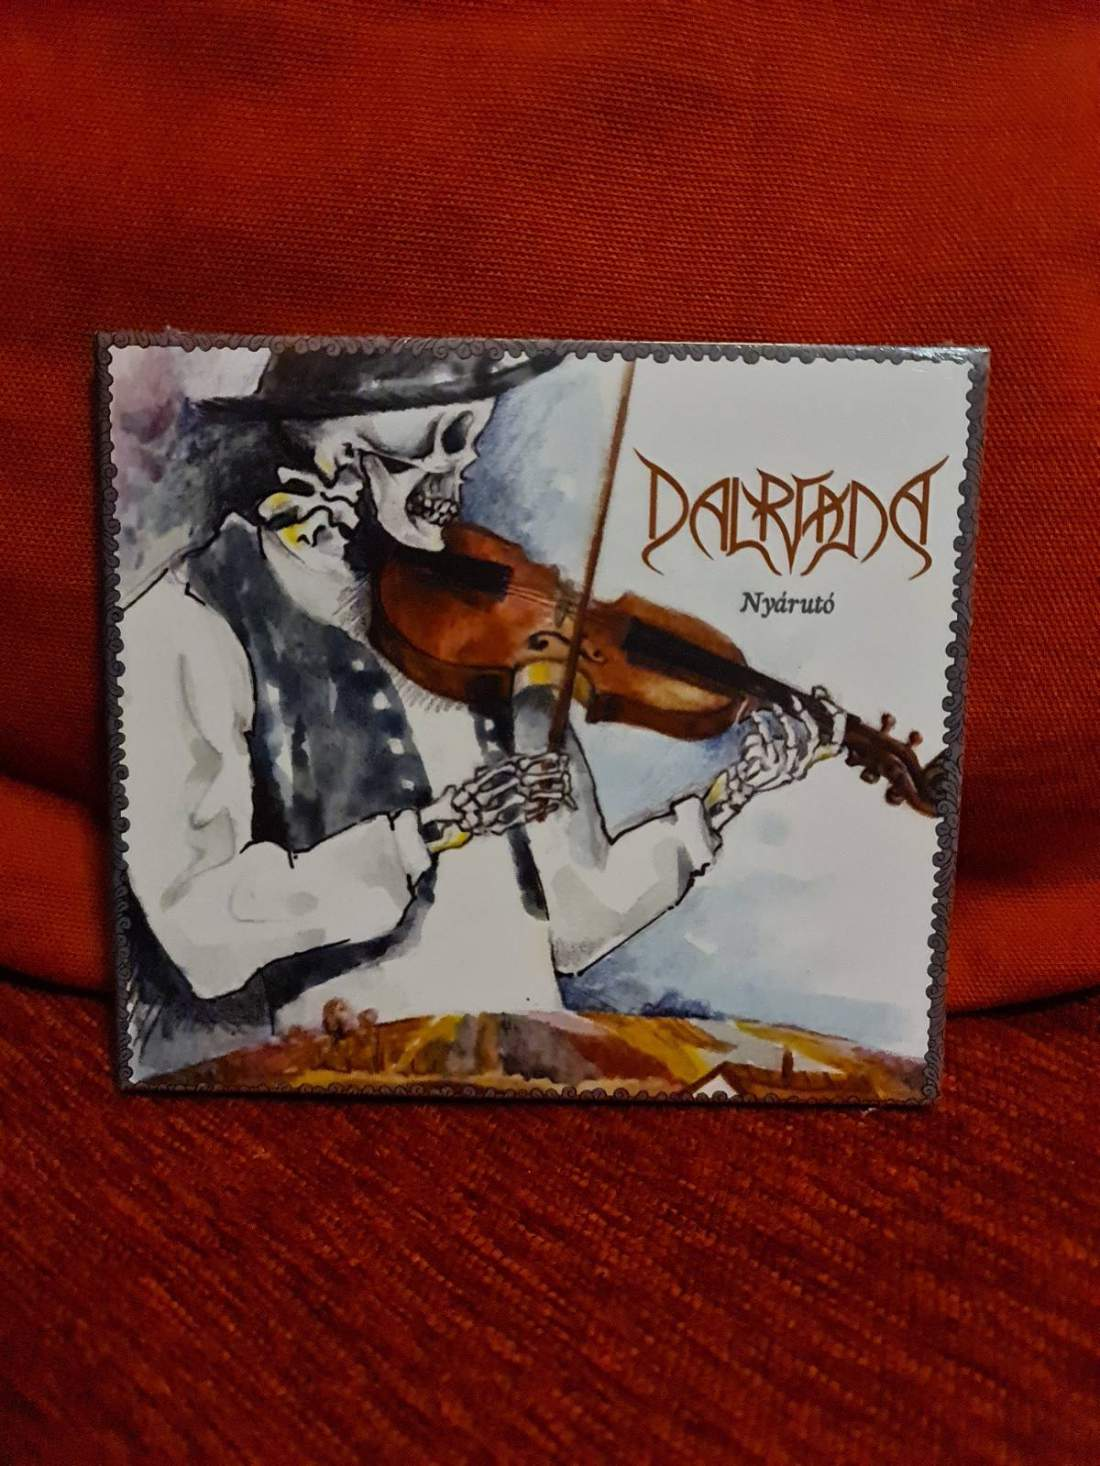 DALRIADA - NYÁRAUTÓ CD